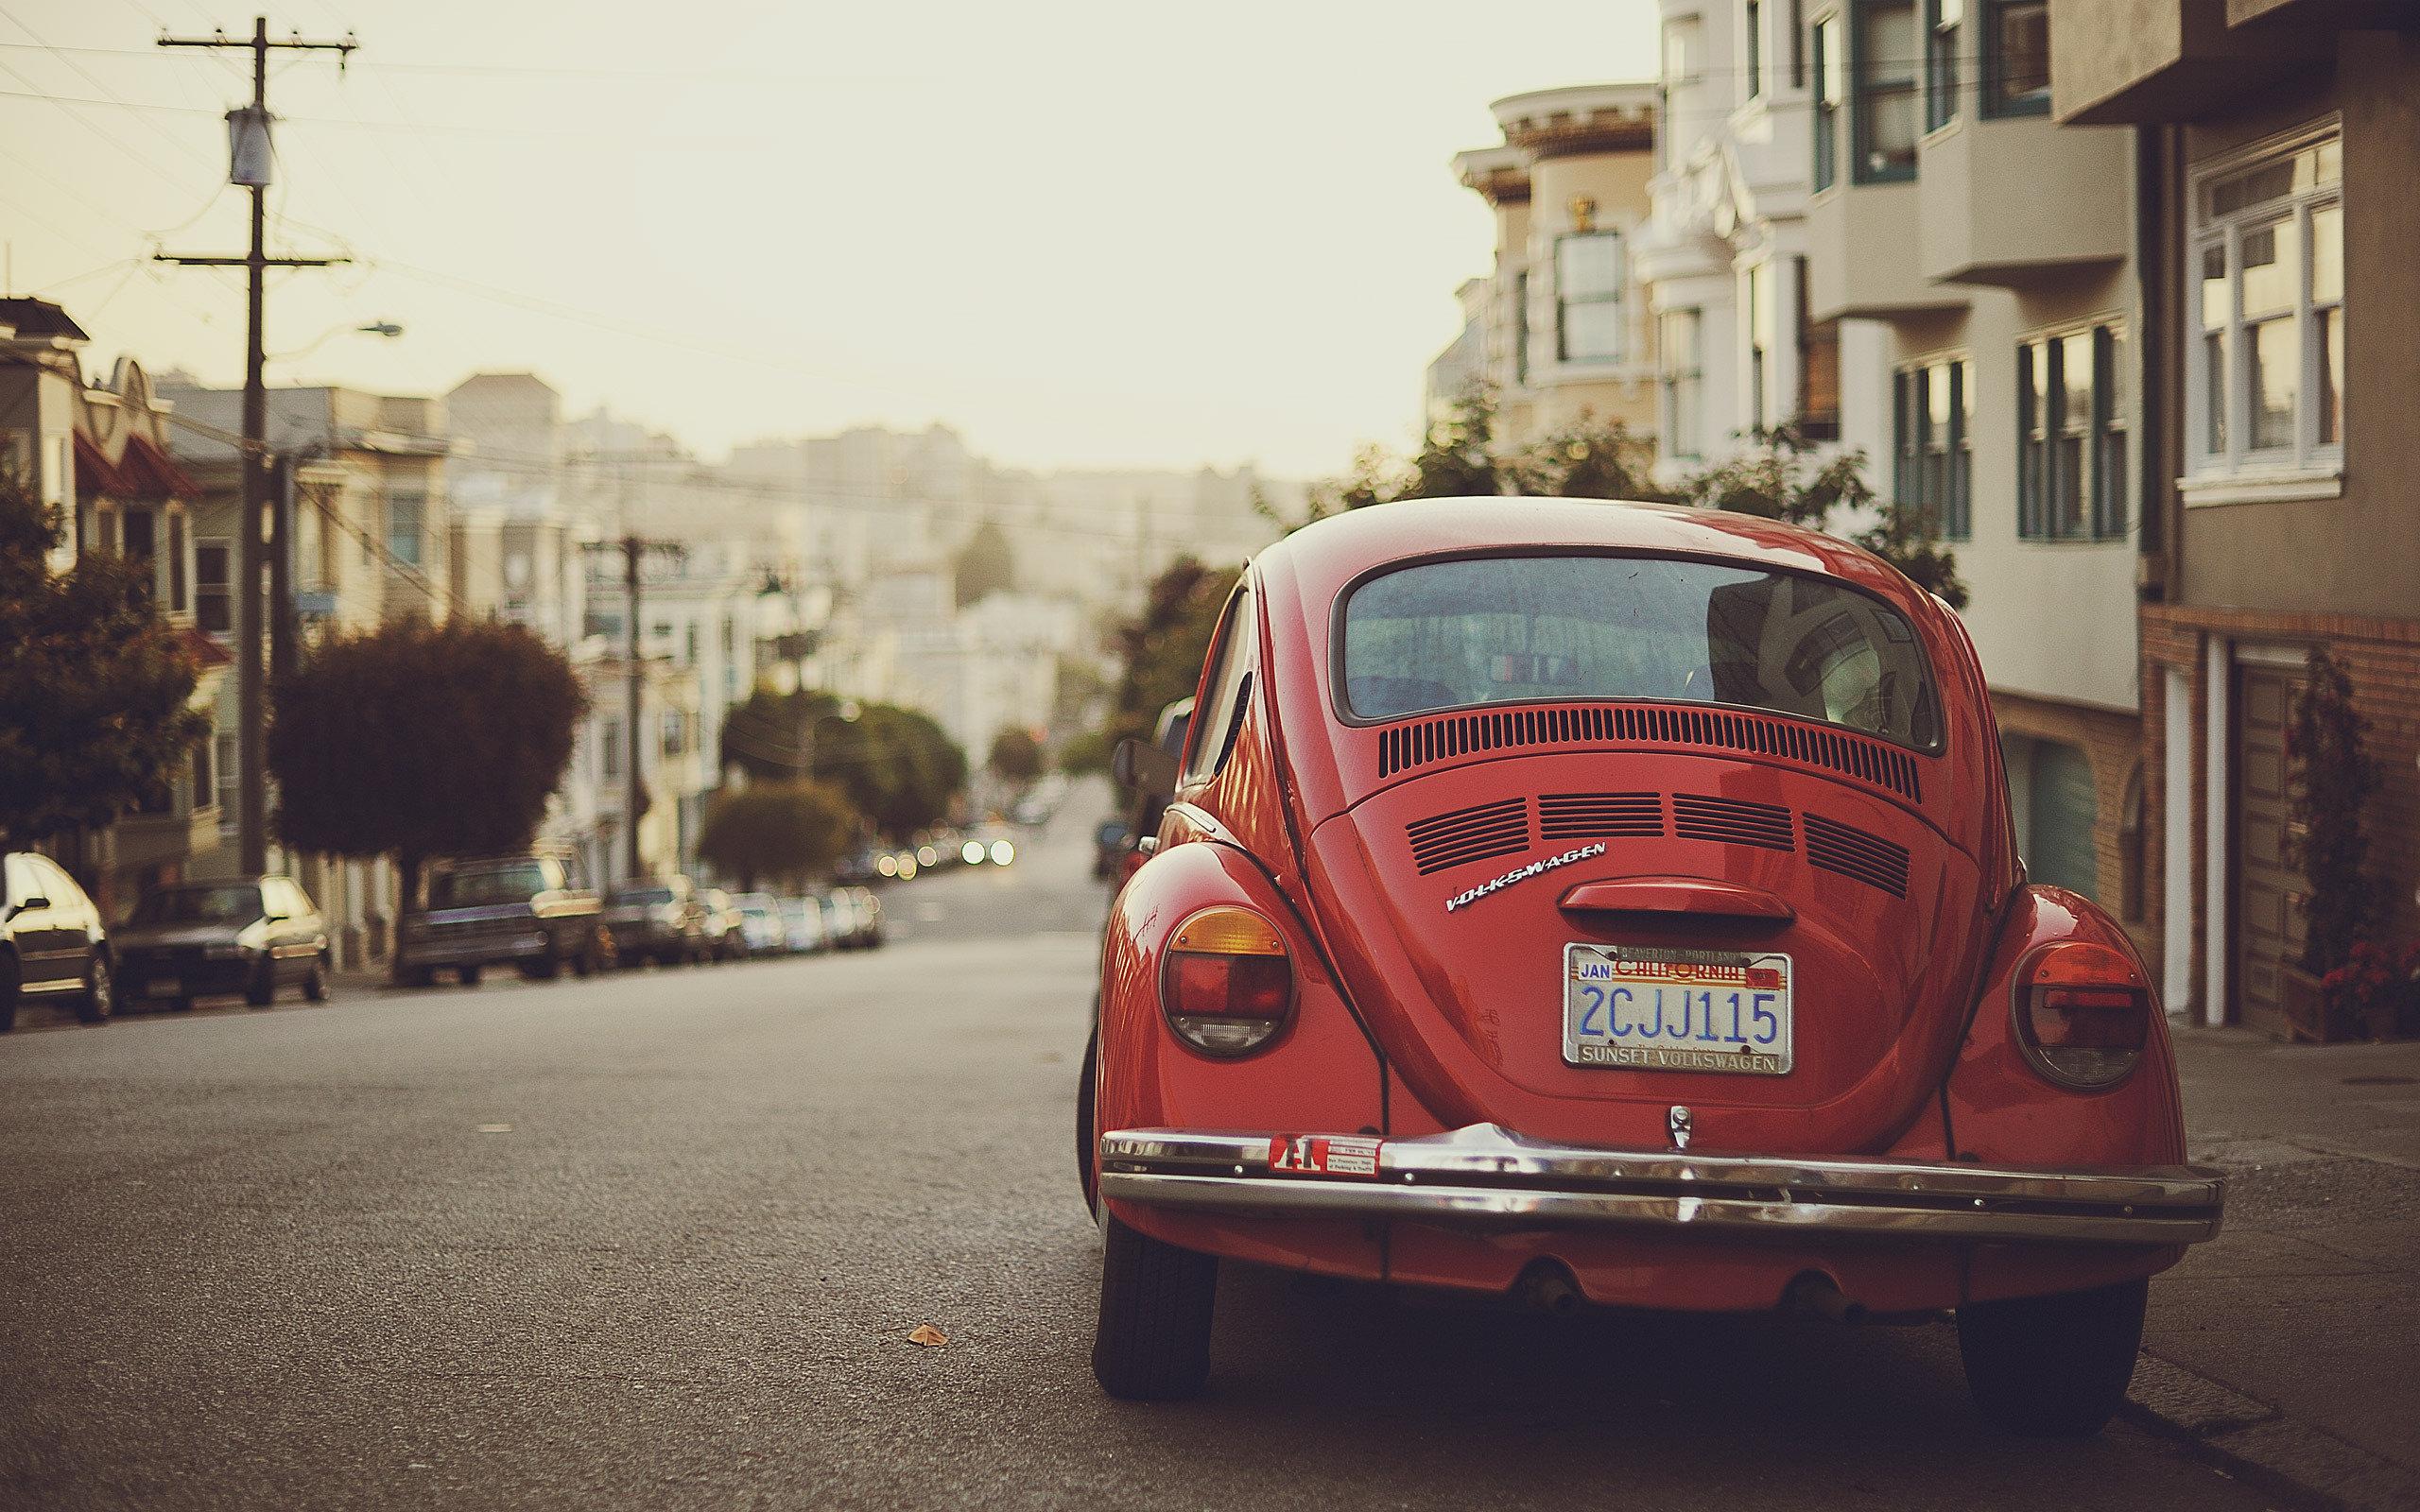 308 Volkswagen HD Wallpapers | Backgrounds - Wallpaper Abyss